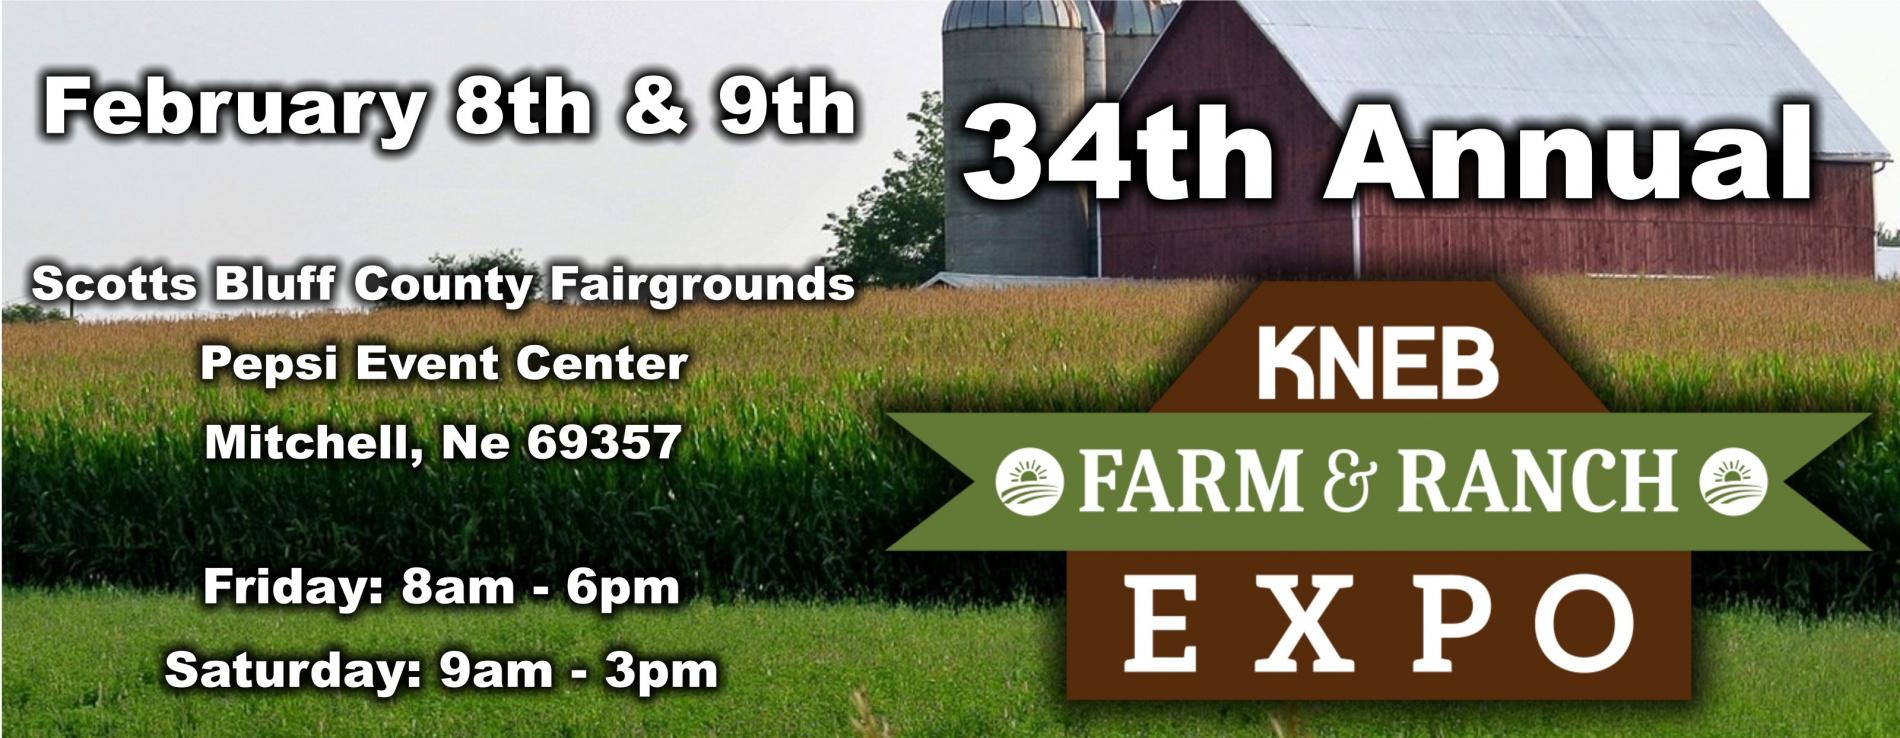 Farm Show Promo